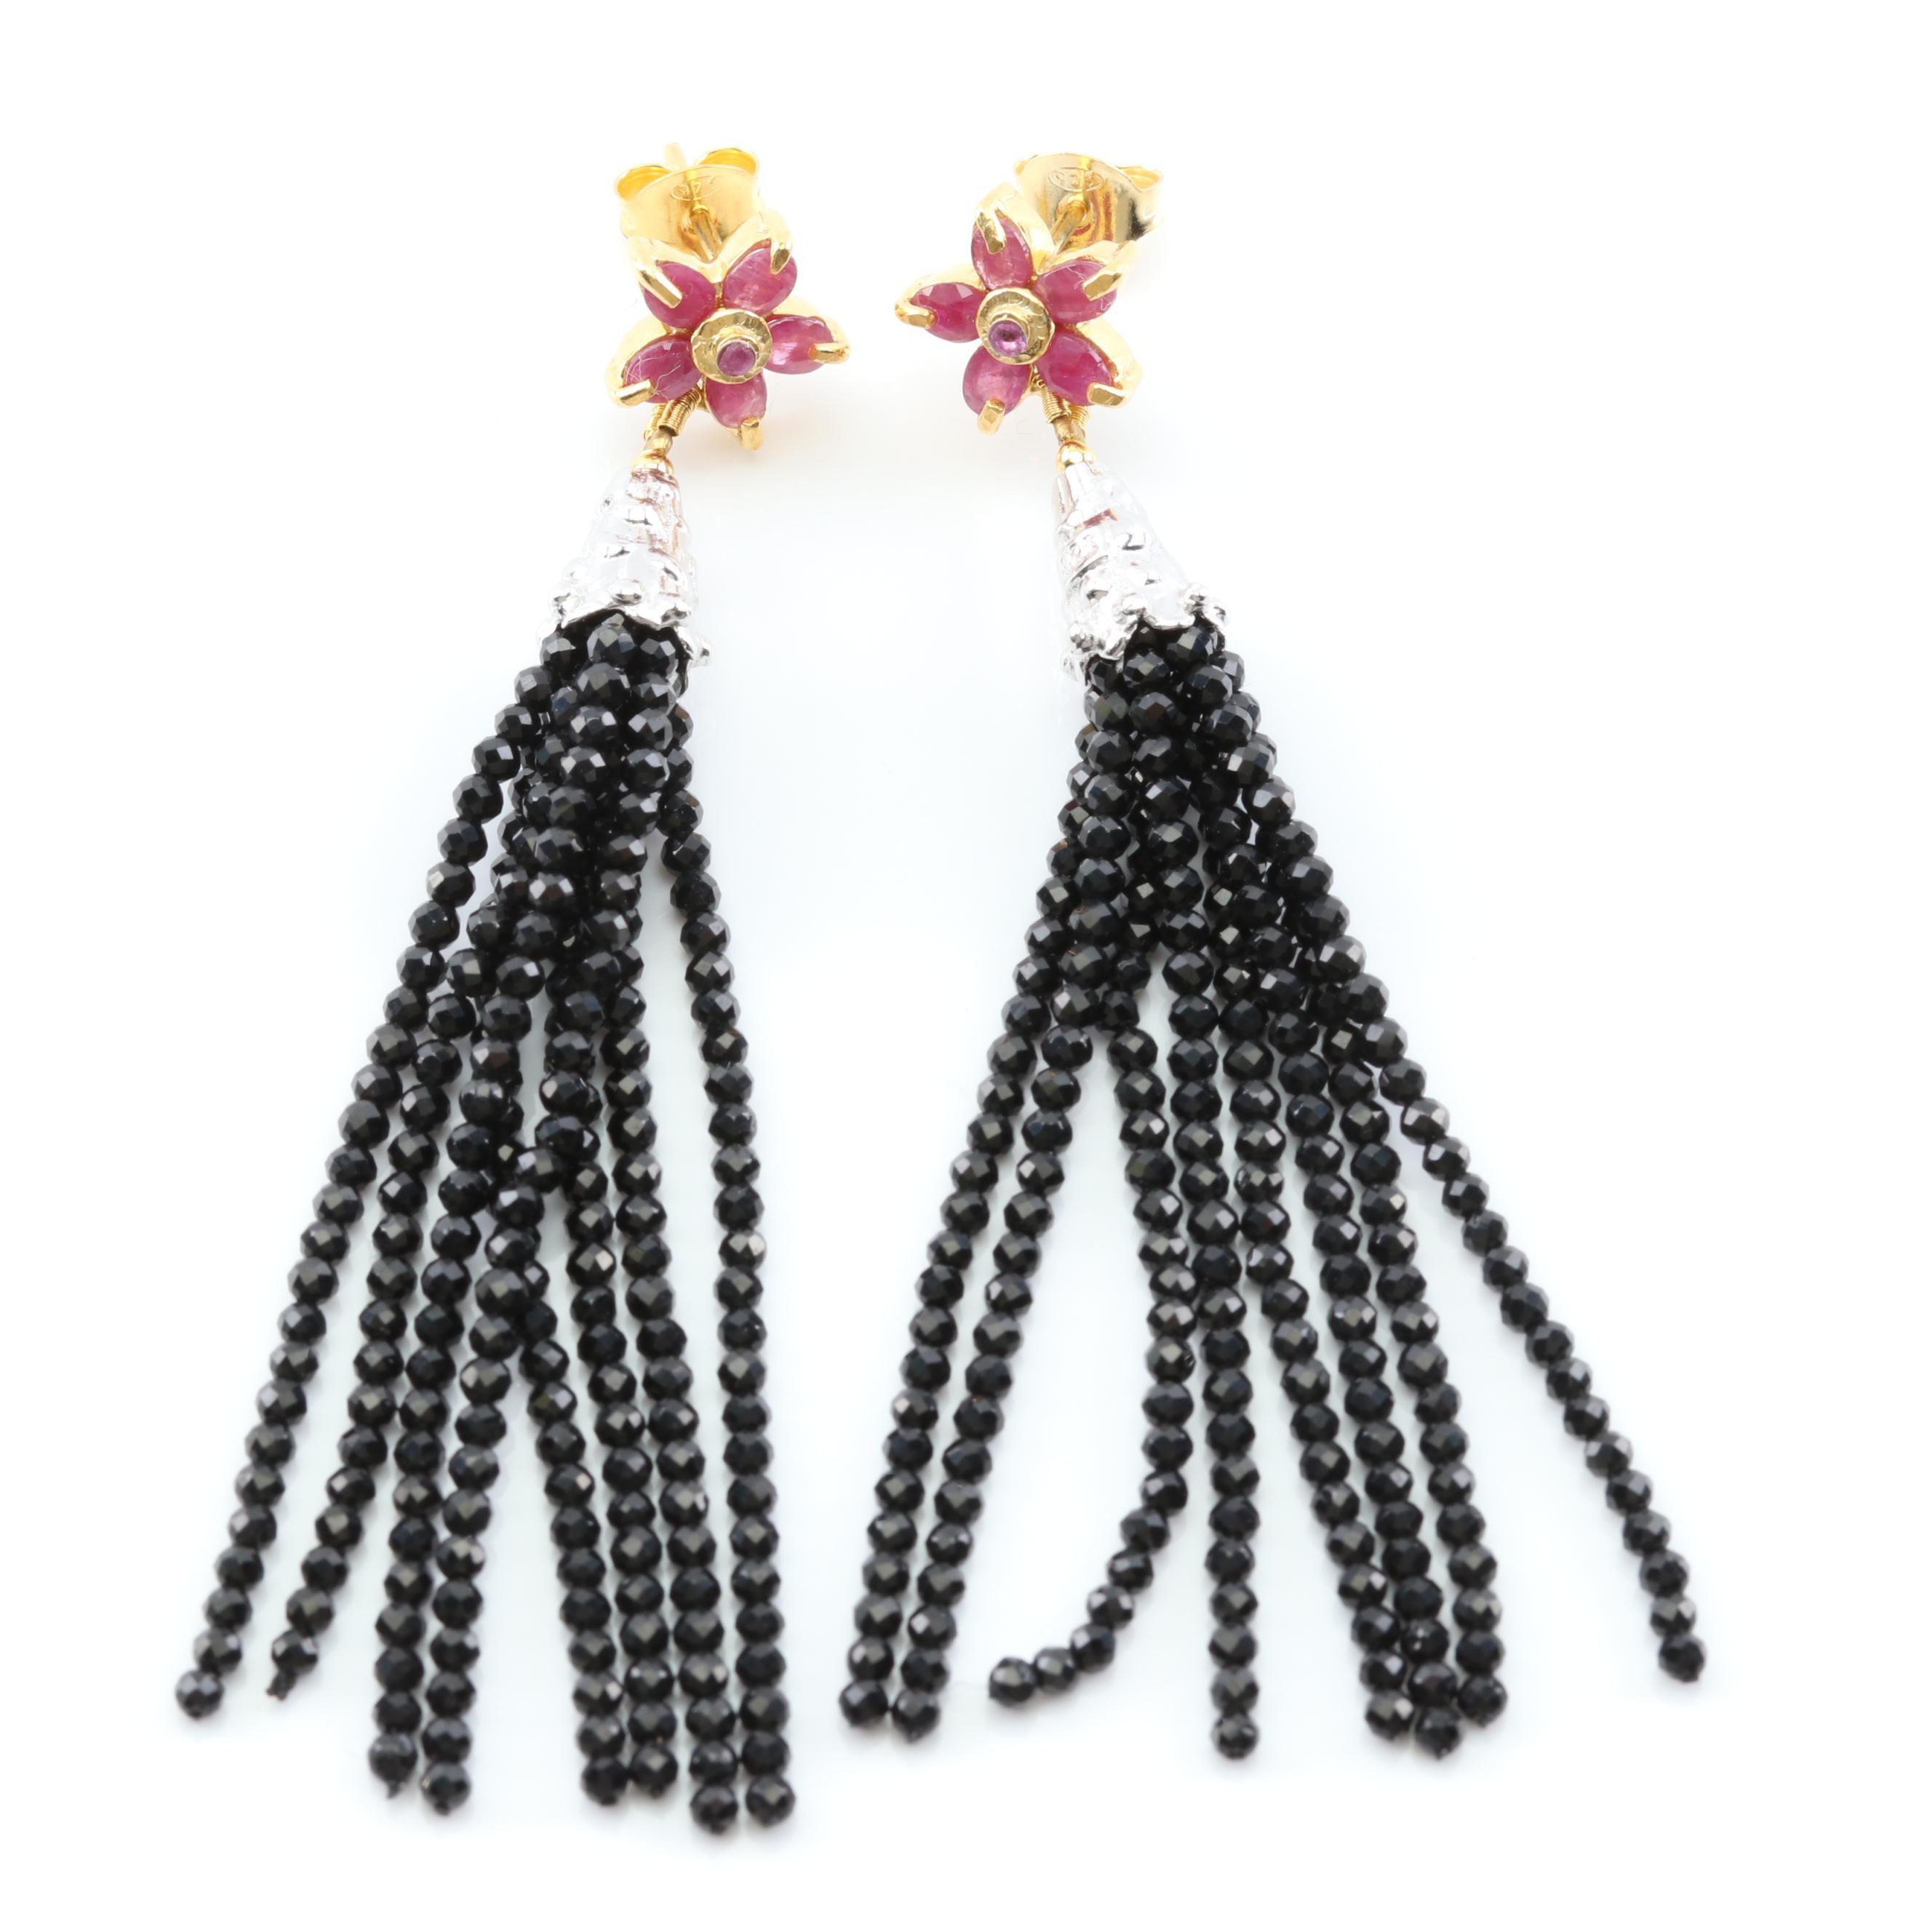 Sterling Silver Ruby Flower Top Earrings with Black Spinel Bead Tassels